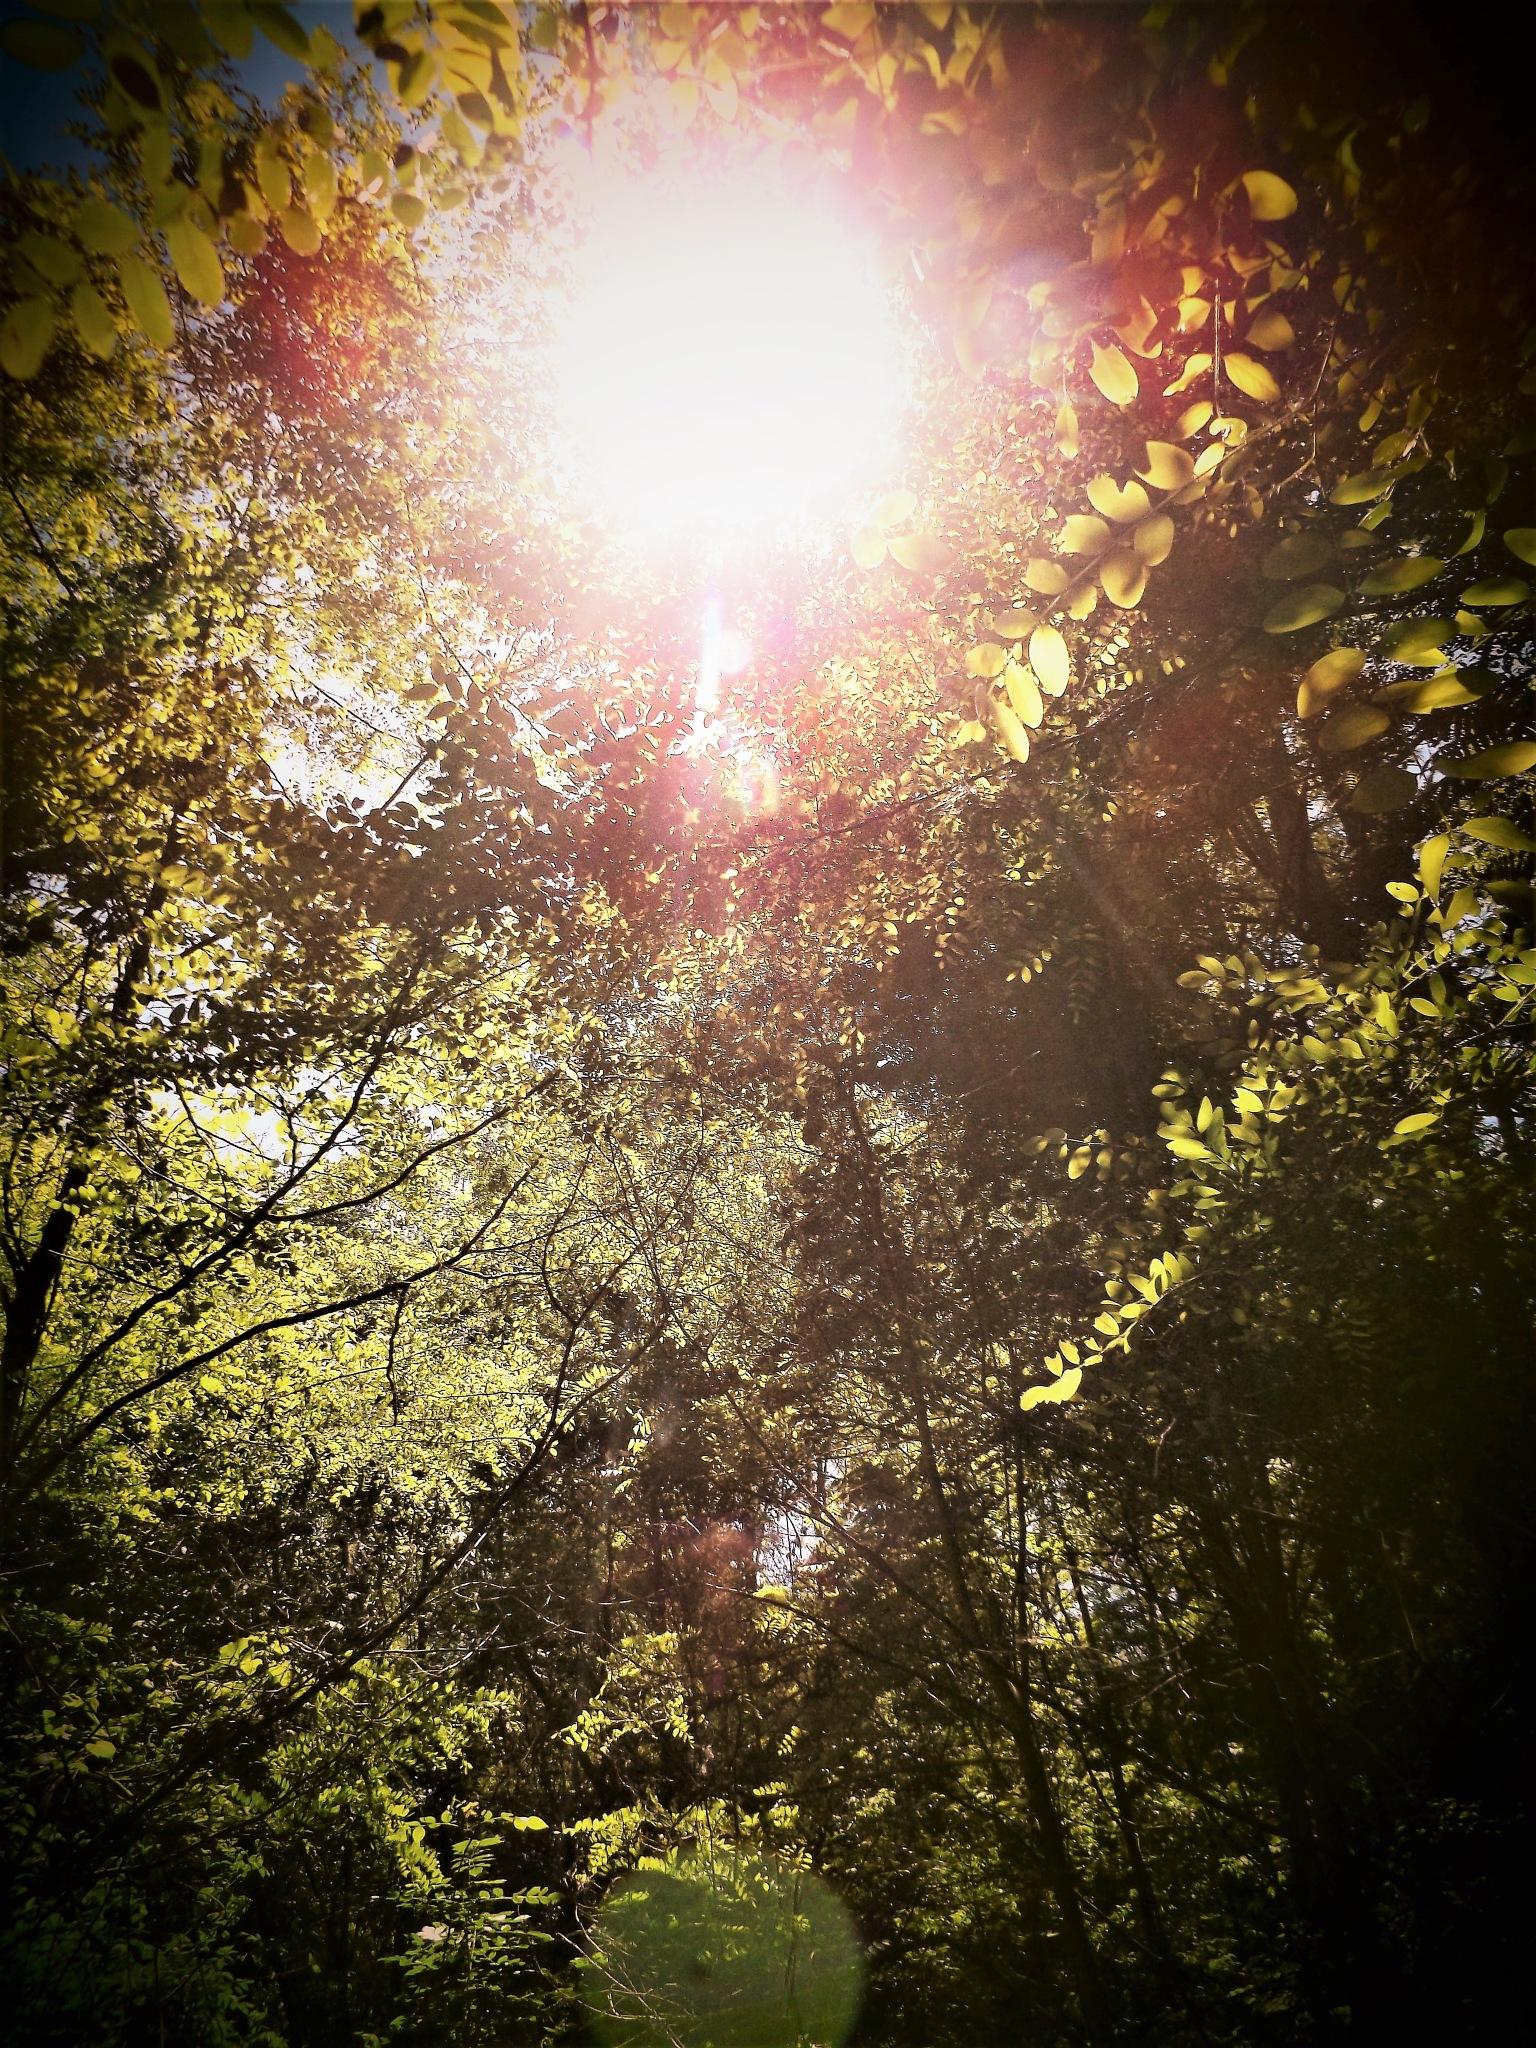 UNUSUAL SUN ORBS by Dawn Hoffmeister